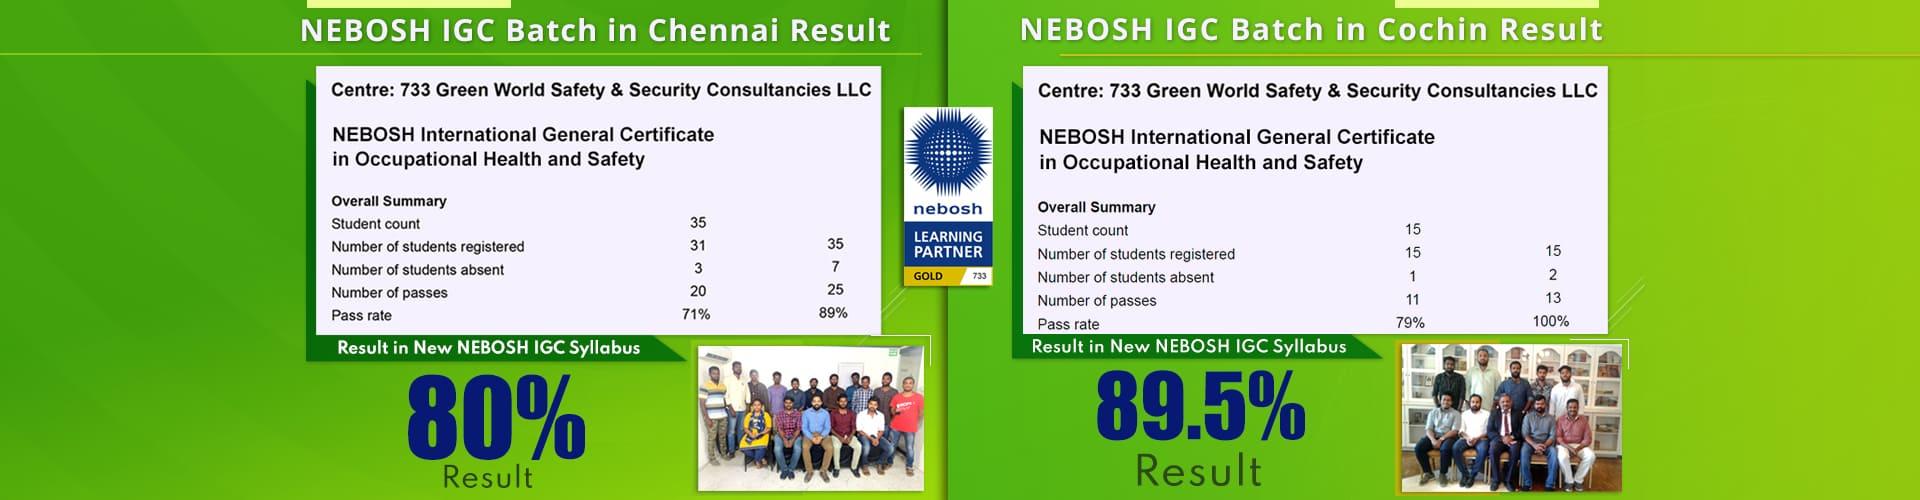 NEBOSH_IGC_Result_Banner_Jun_2020_coin_